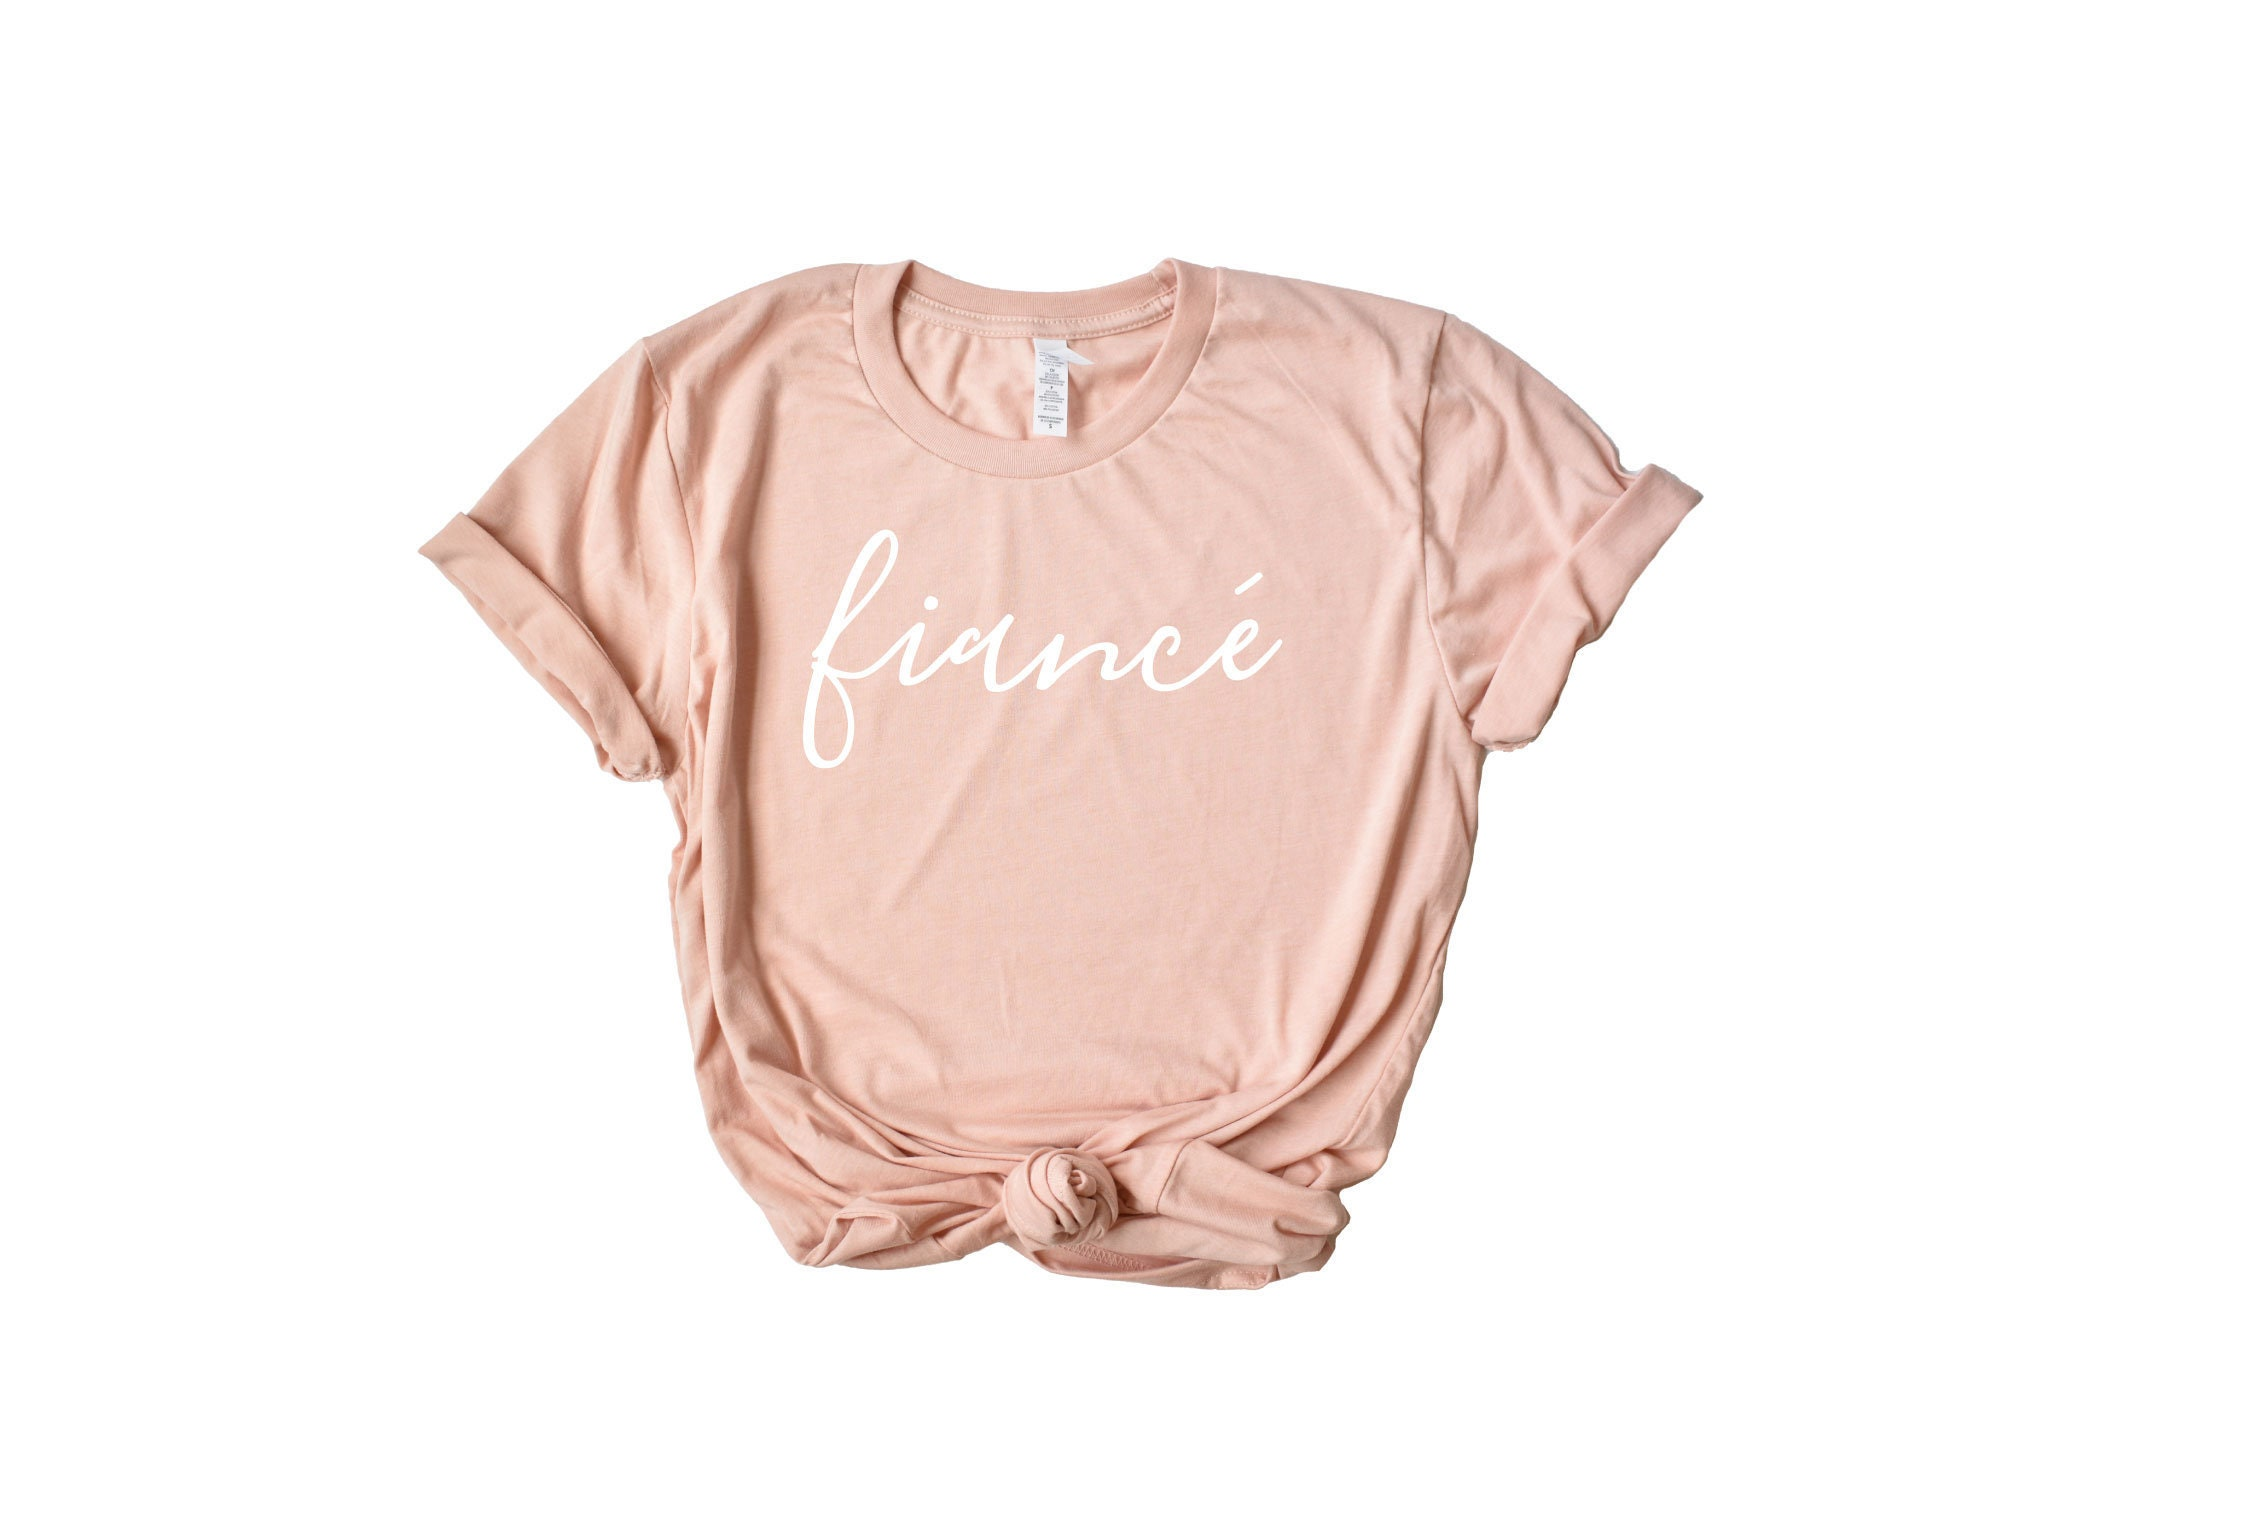 Fiance Shirt Bridal Shower Gift Gift for Bride I said | Etsy